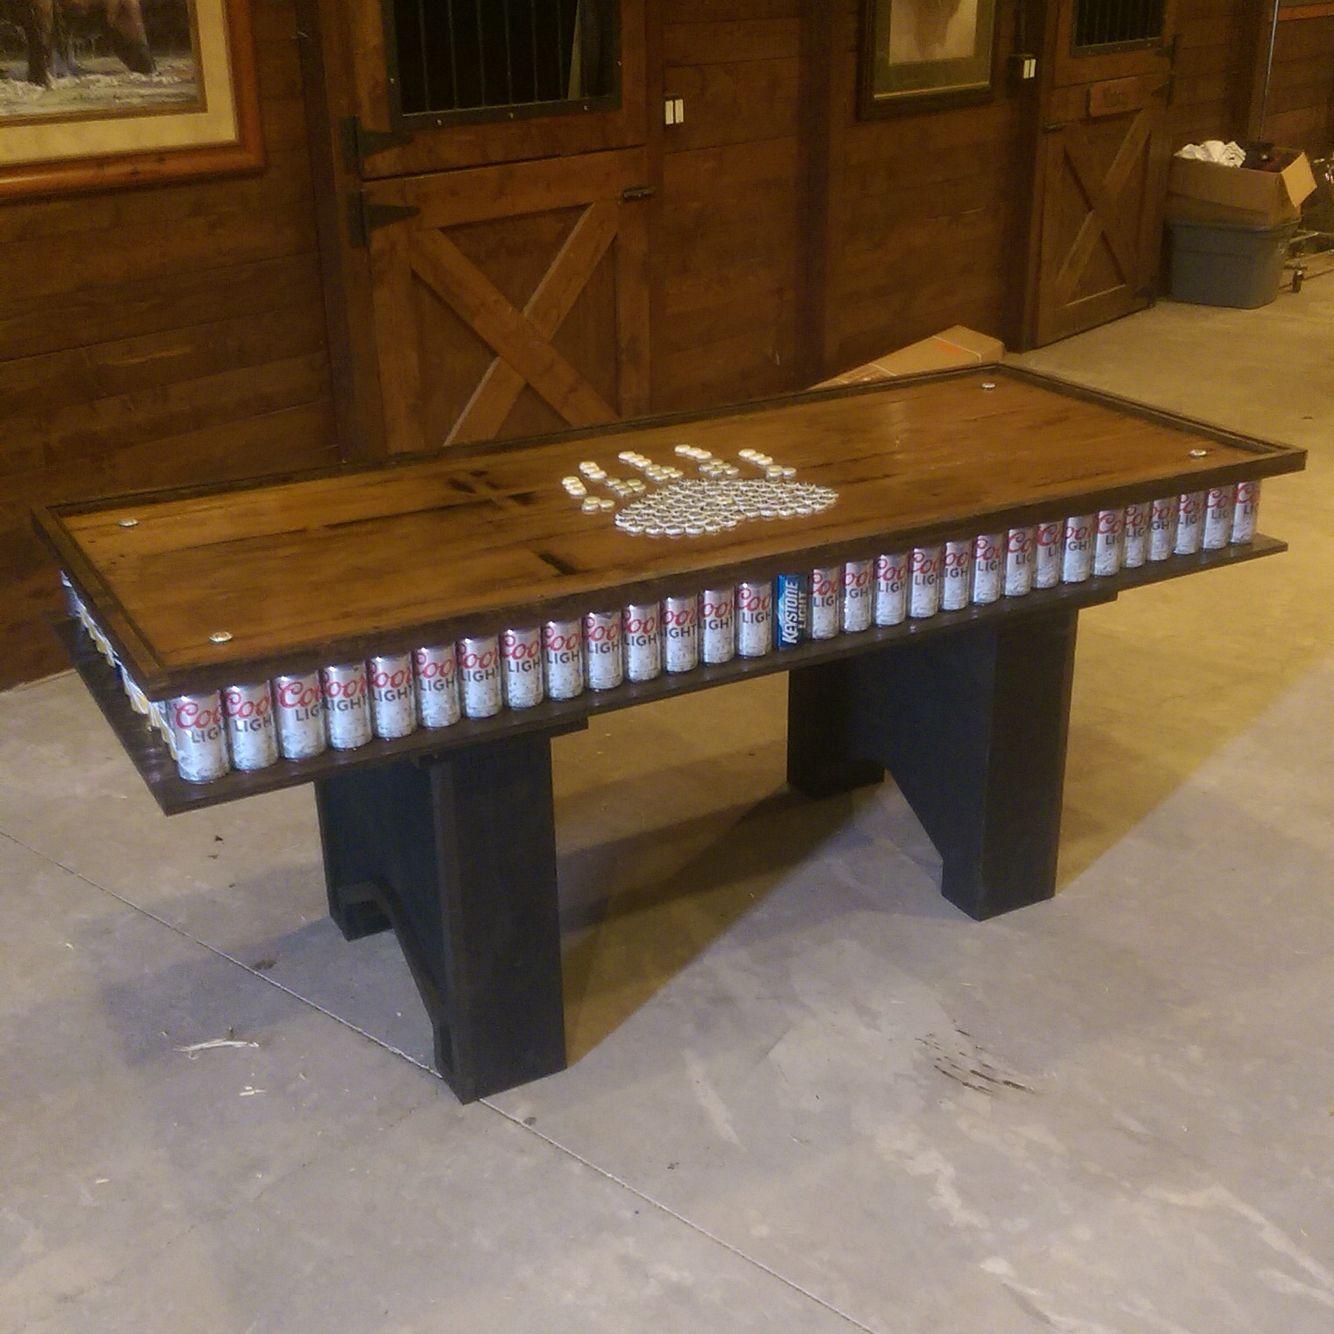 College DIY Wood Beer Pong Table Stuff Pinterest Beer Pong - Custom vinyl decals for beer pong tables